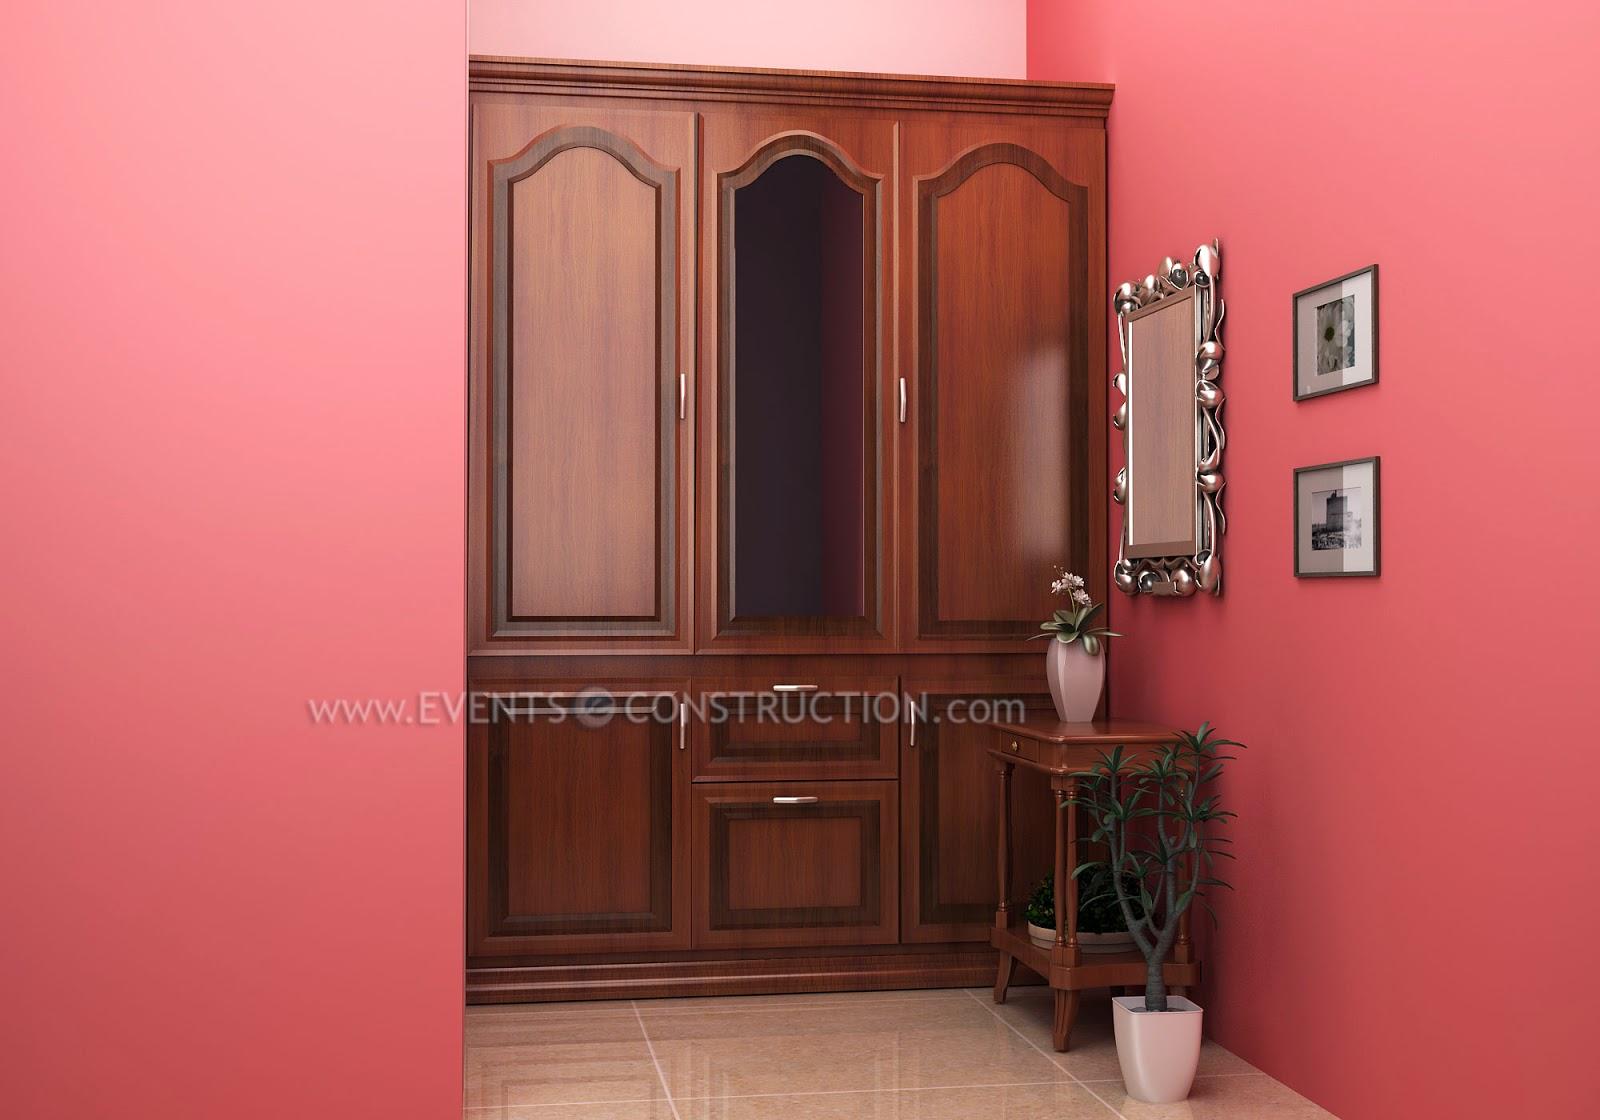 Evens construction pvt ltd wooden wardrobe design for Dressing area designs